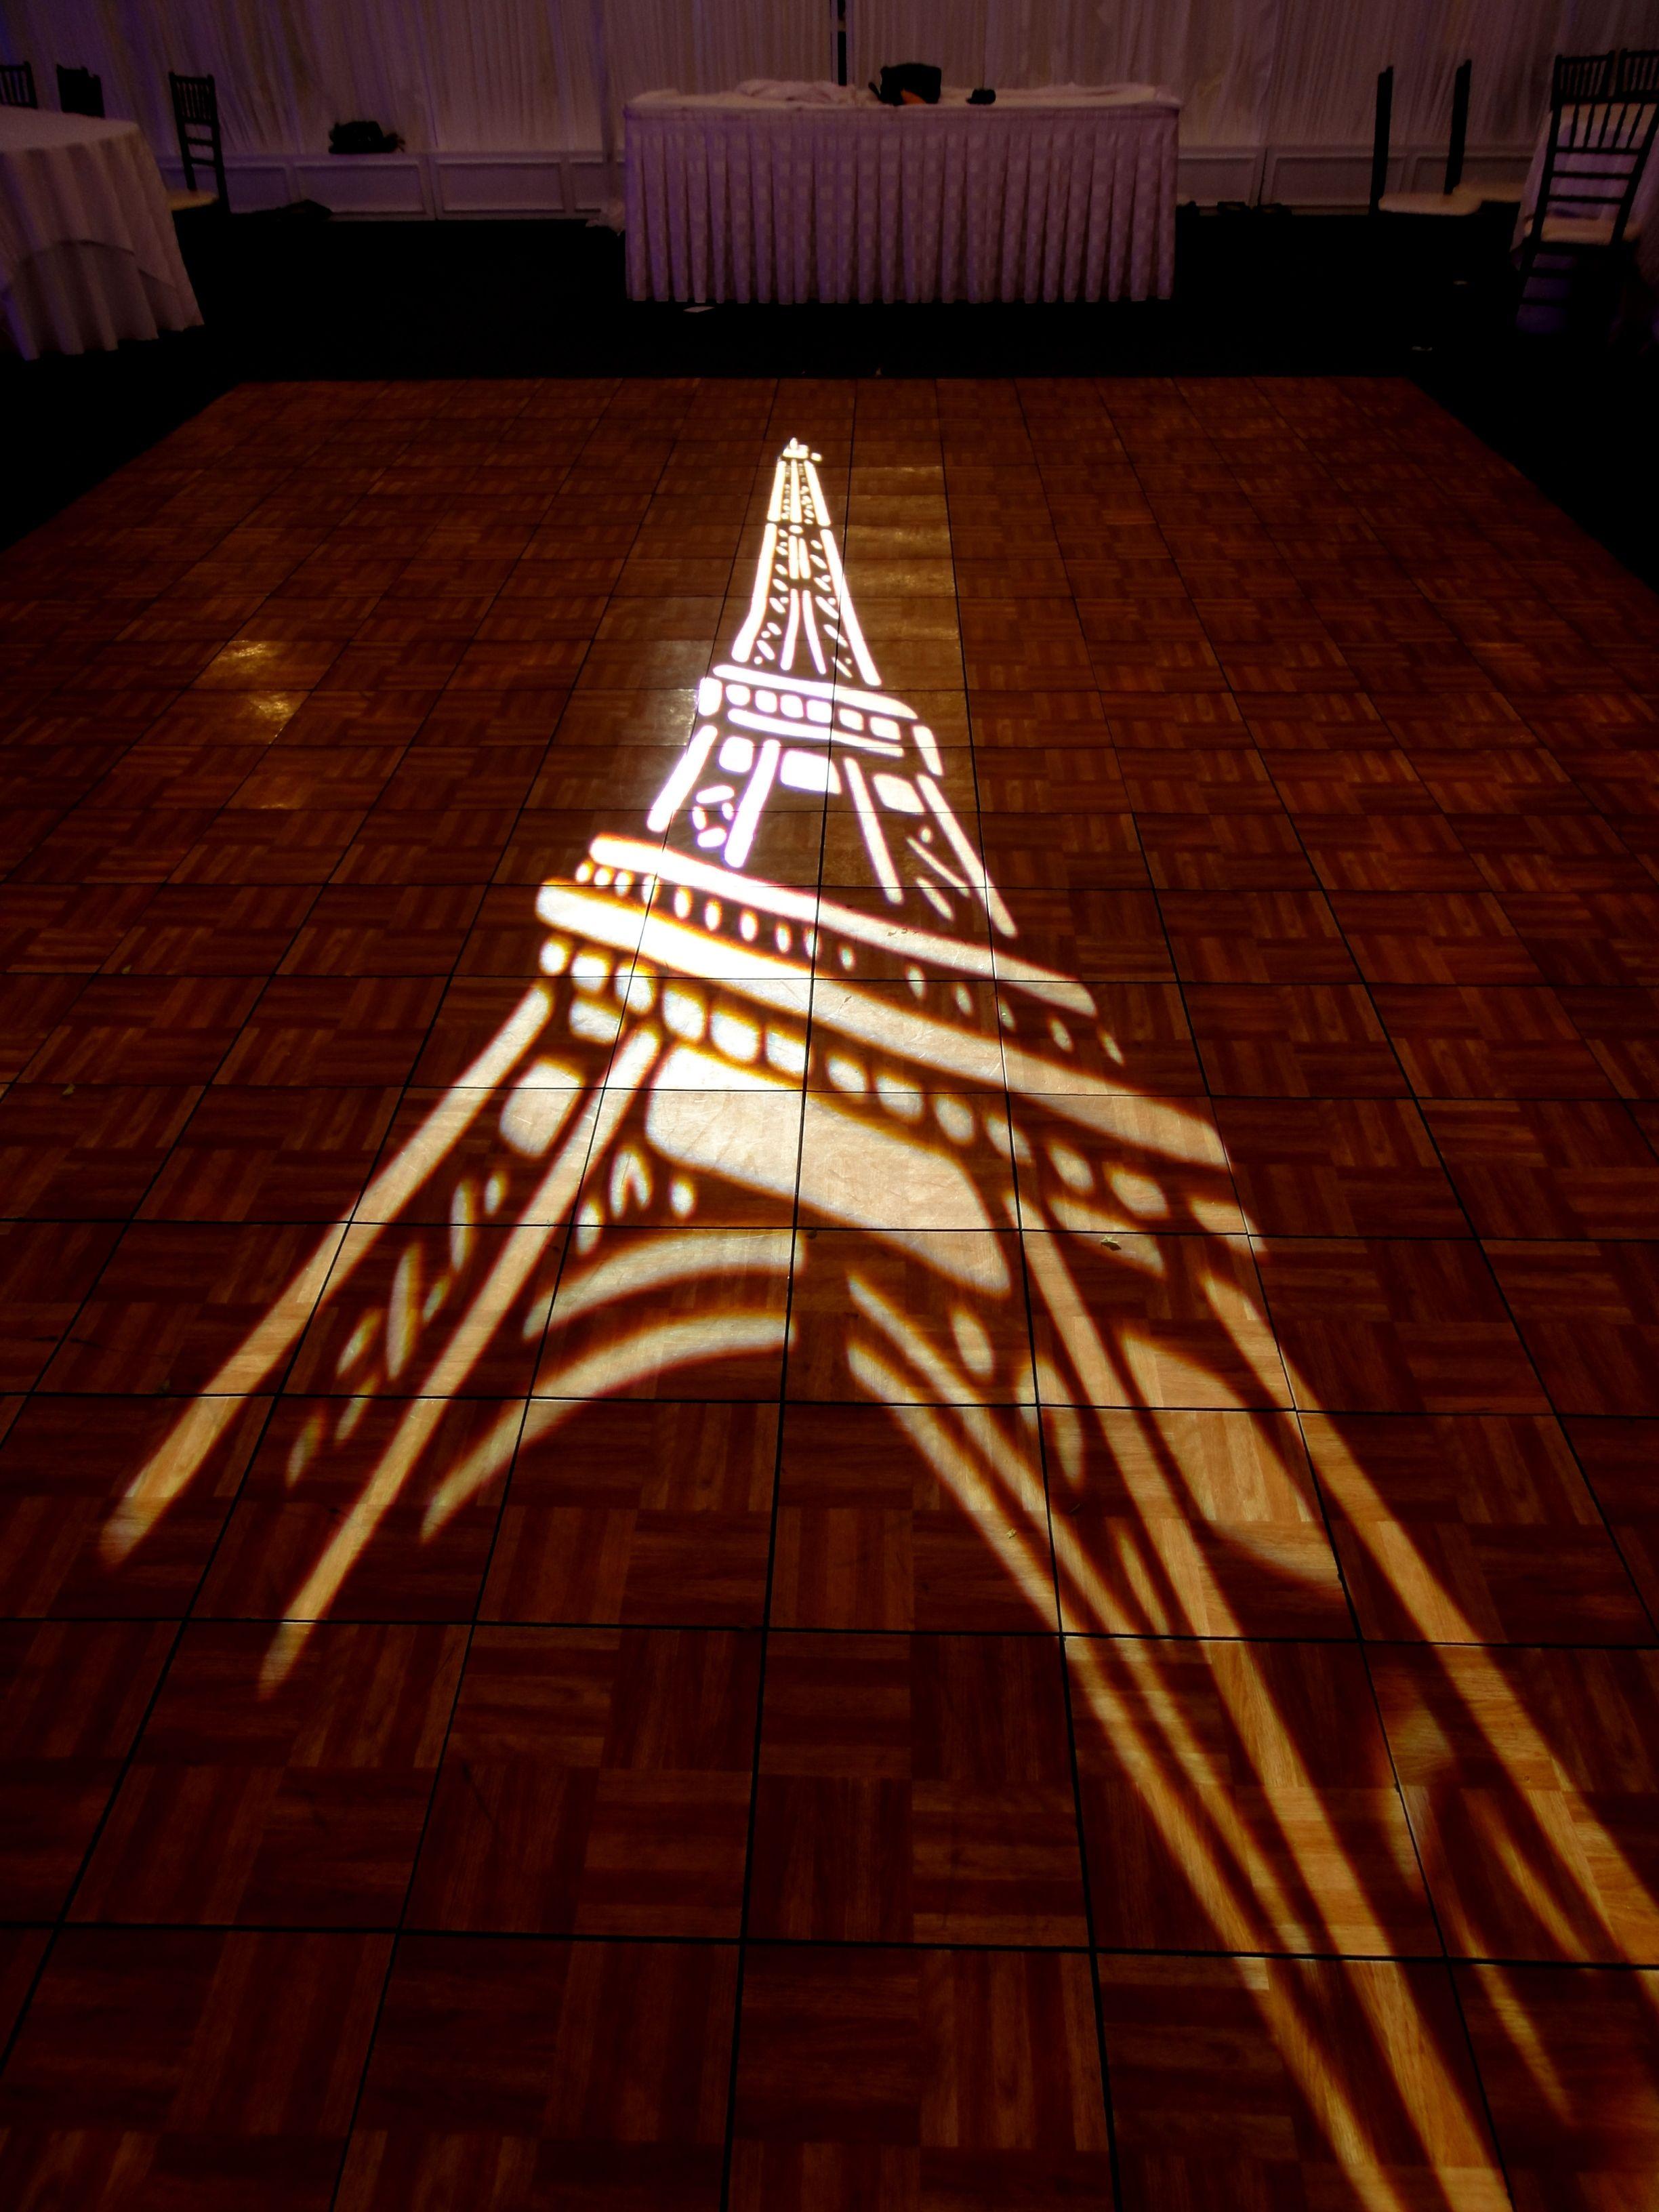 Parisian theme wedding with Eifel Tower gobo dance floor projection